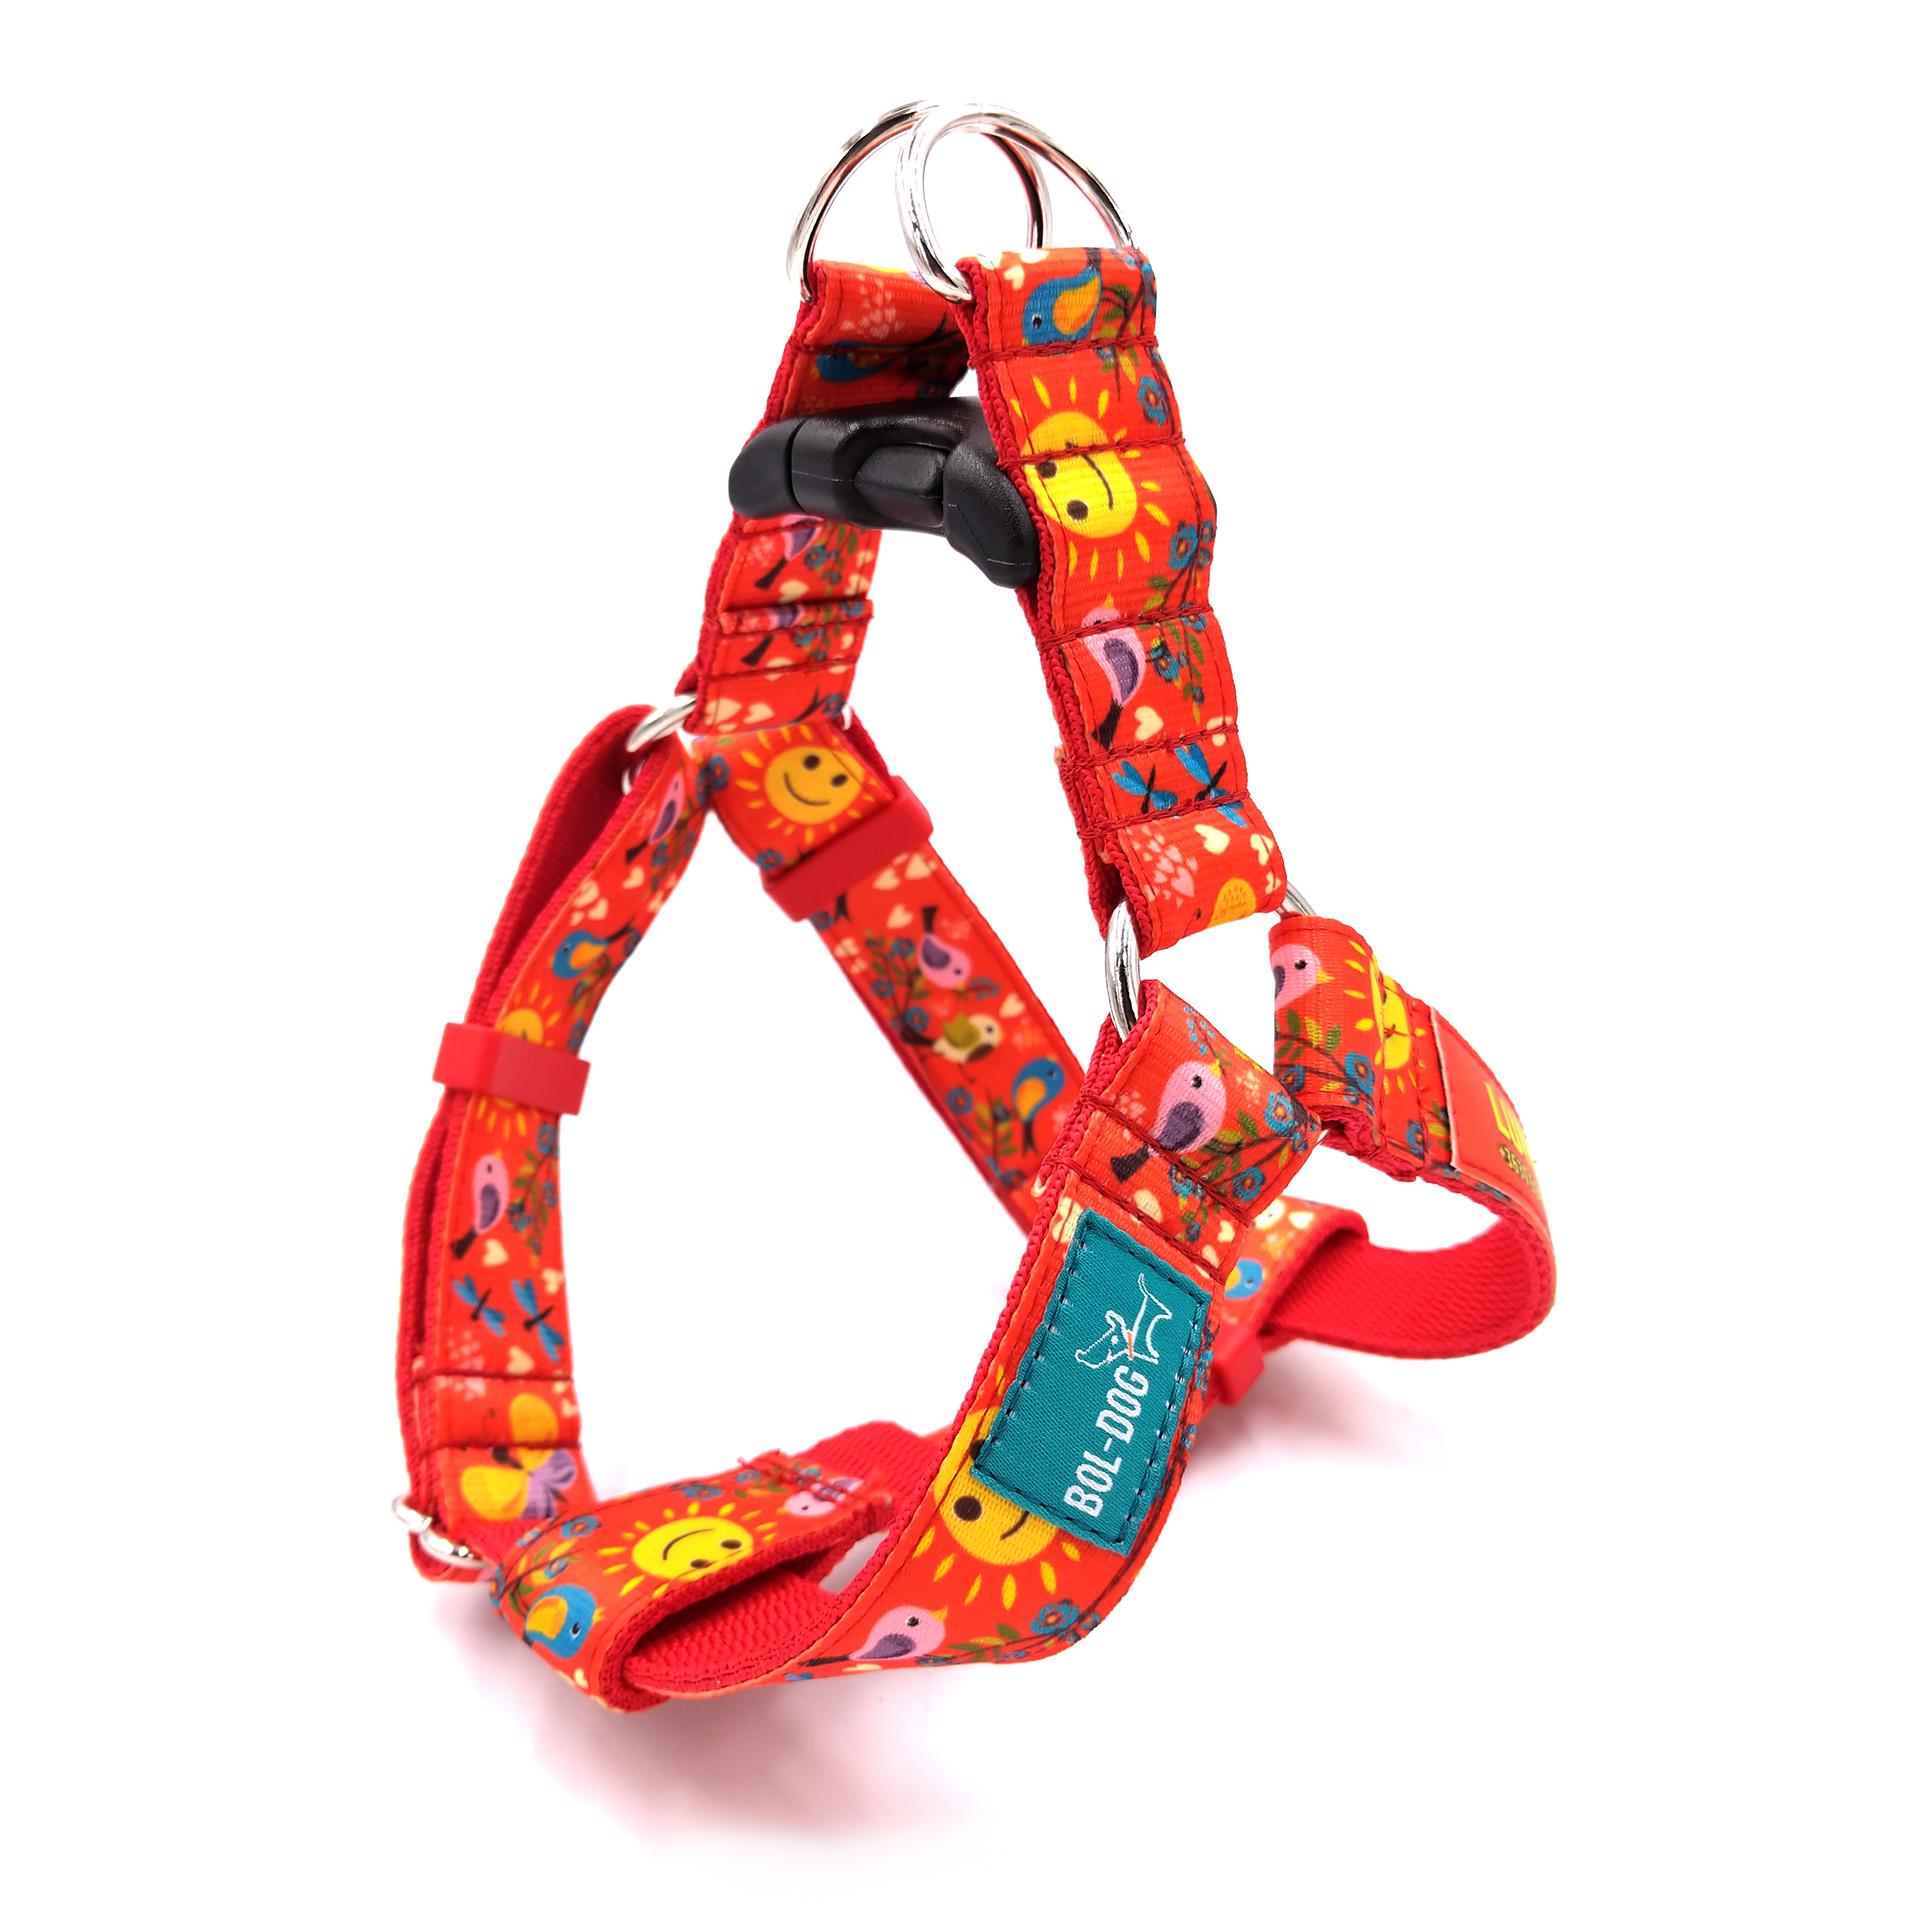 Spring dog harness